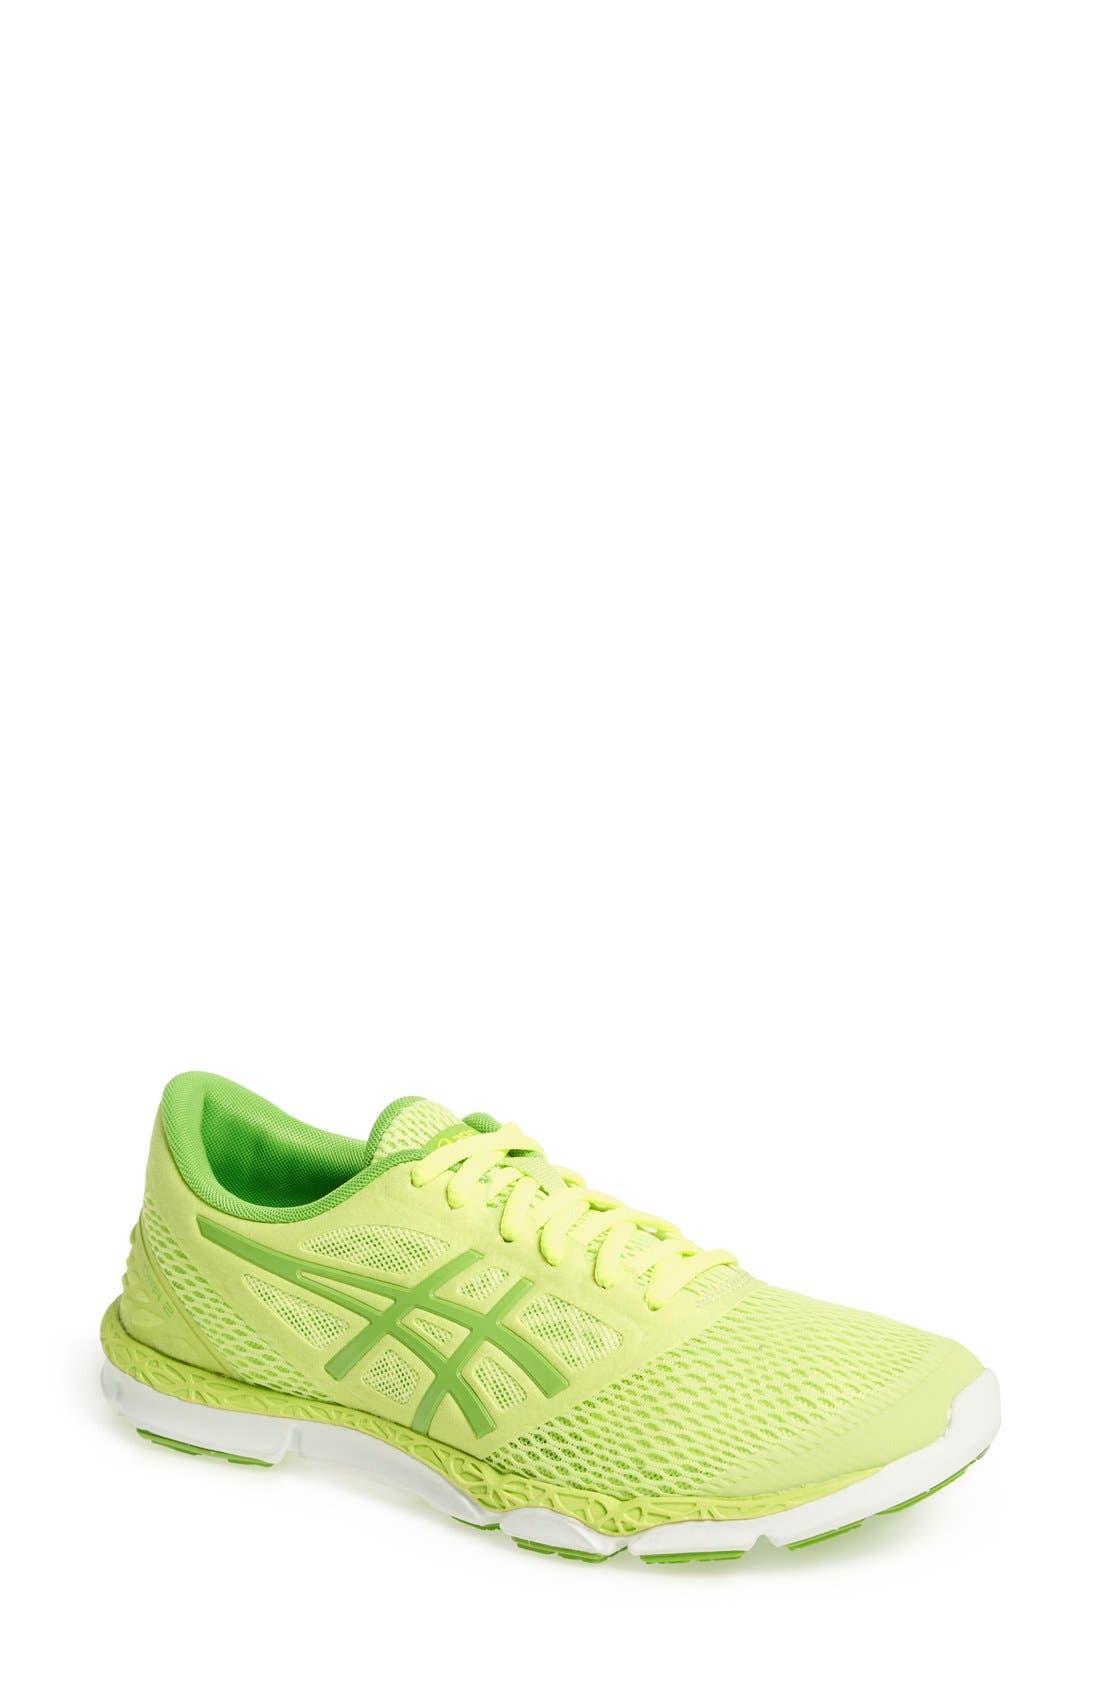 Alternate Image 1 Selected - ASICS® '33 DFA 2' Running Shoe (Women)